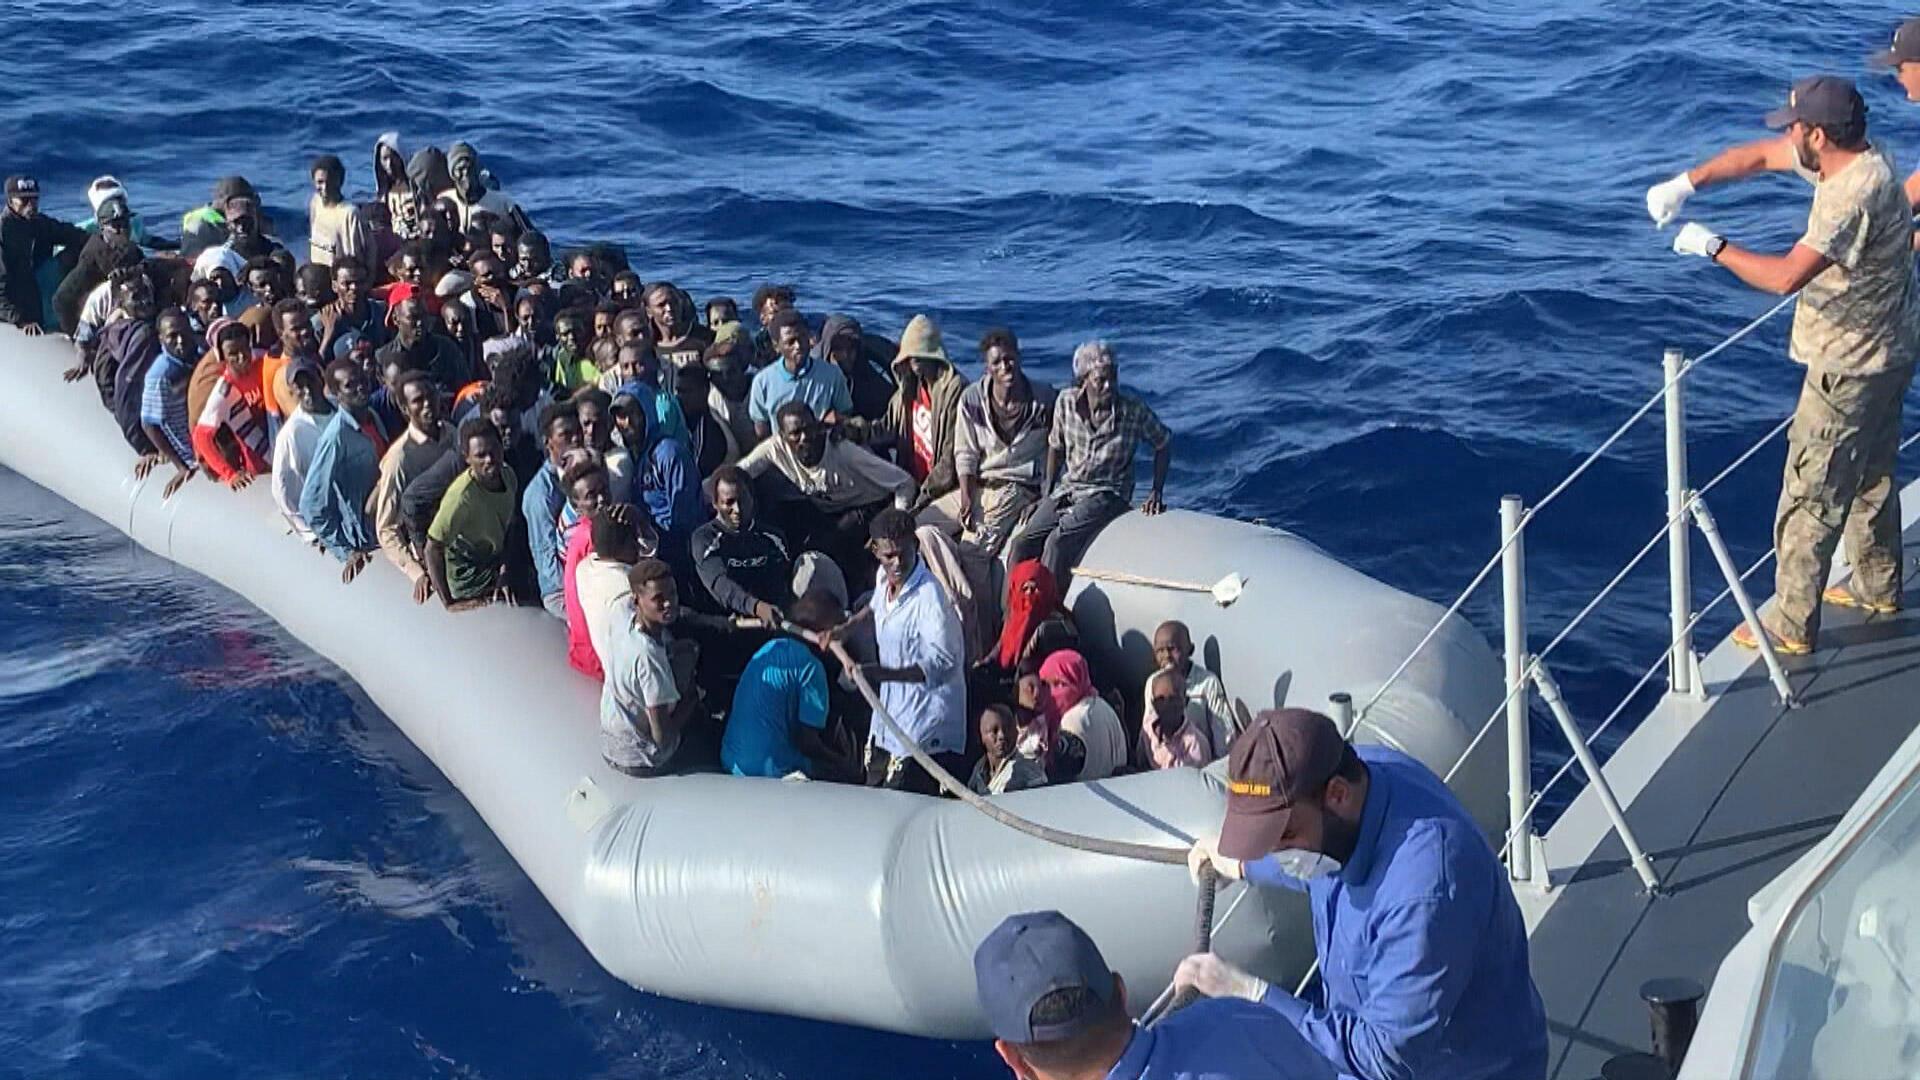 xx PUSH PICTURE RERDOC LIBYE (0-00-00-00)_2